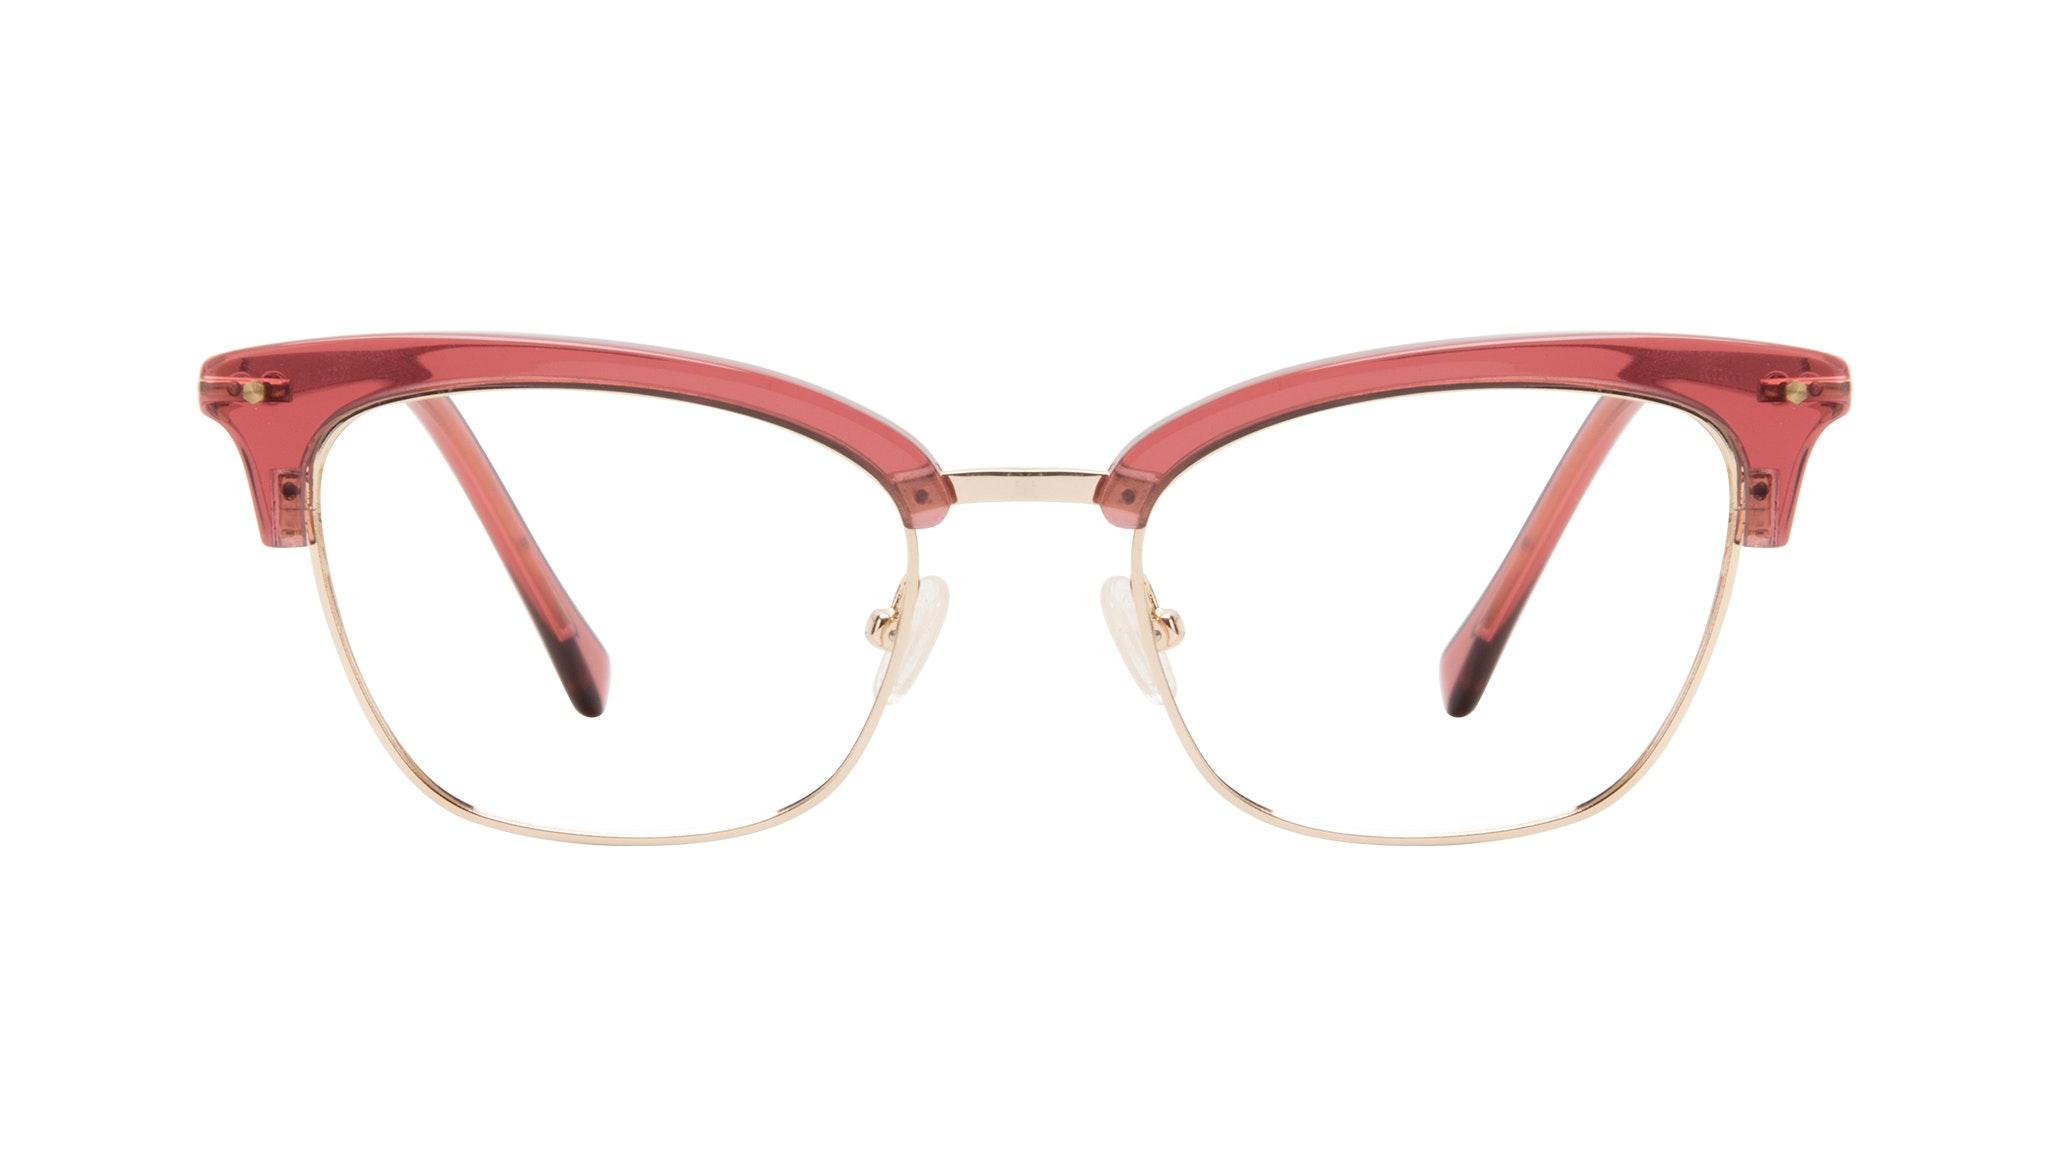 Affordable Fashion Glasses Cat Eye Eyeglasses Women Savvy Cherry Front